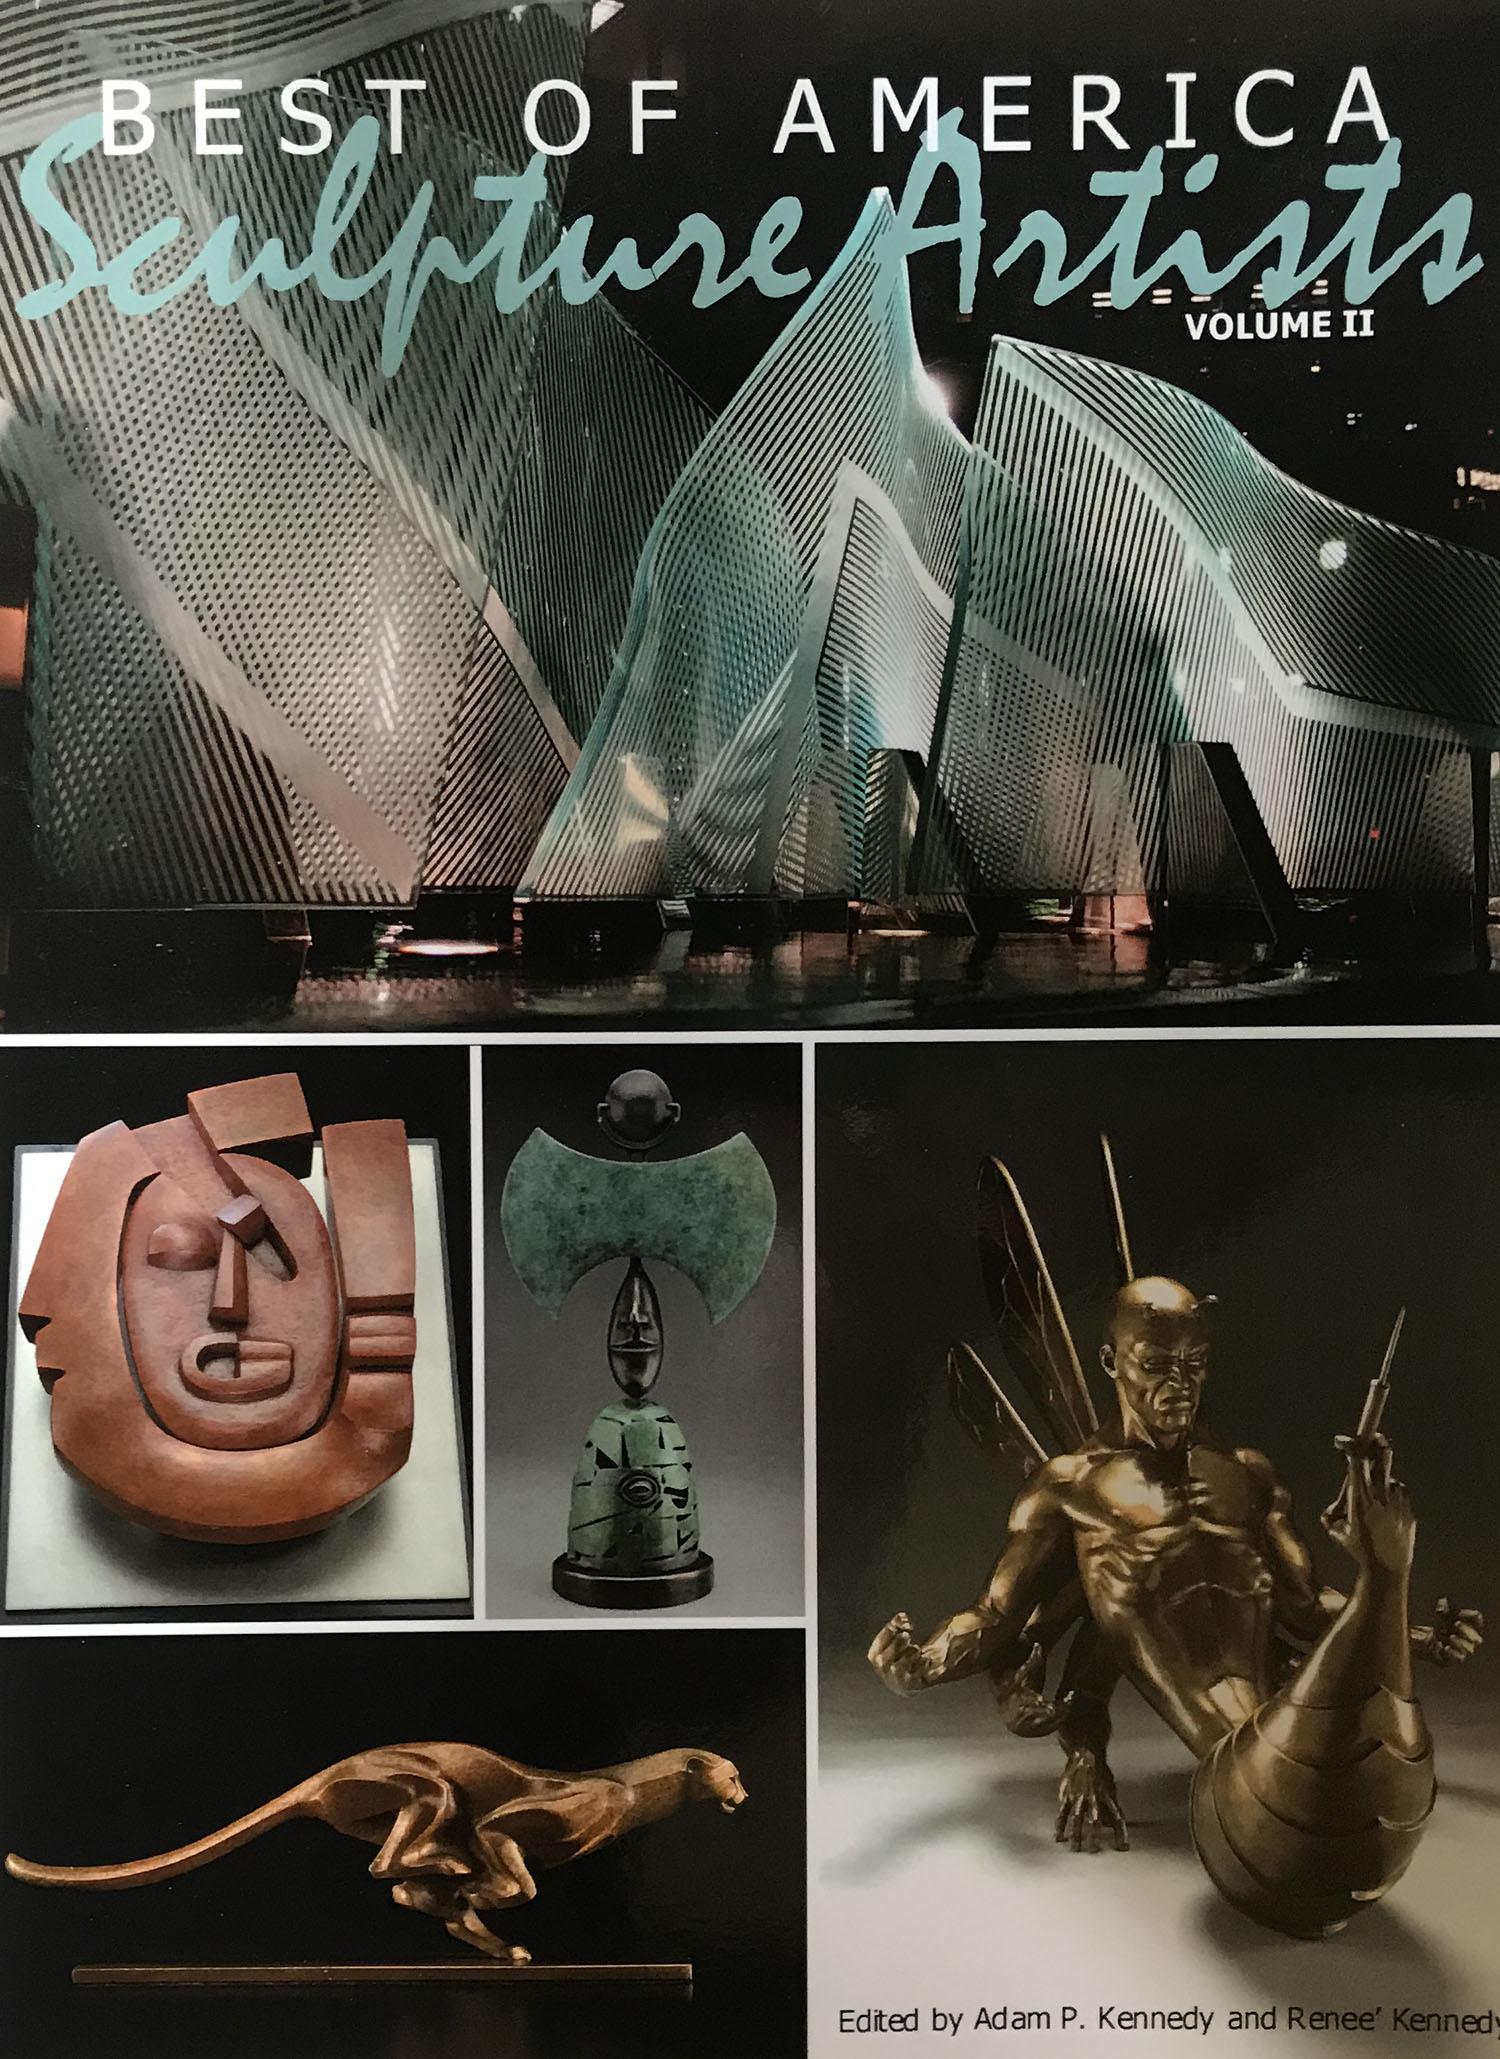 book-bestofamerica-sculpture-artists-volume2-kennedypublishing-williamsburg,va_2009.jpg